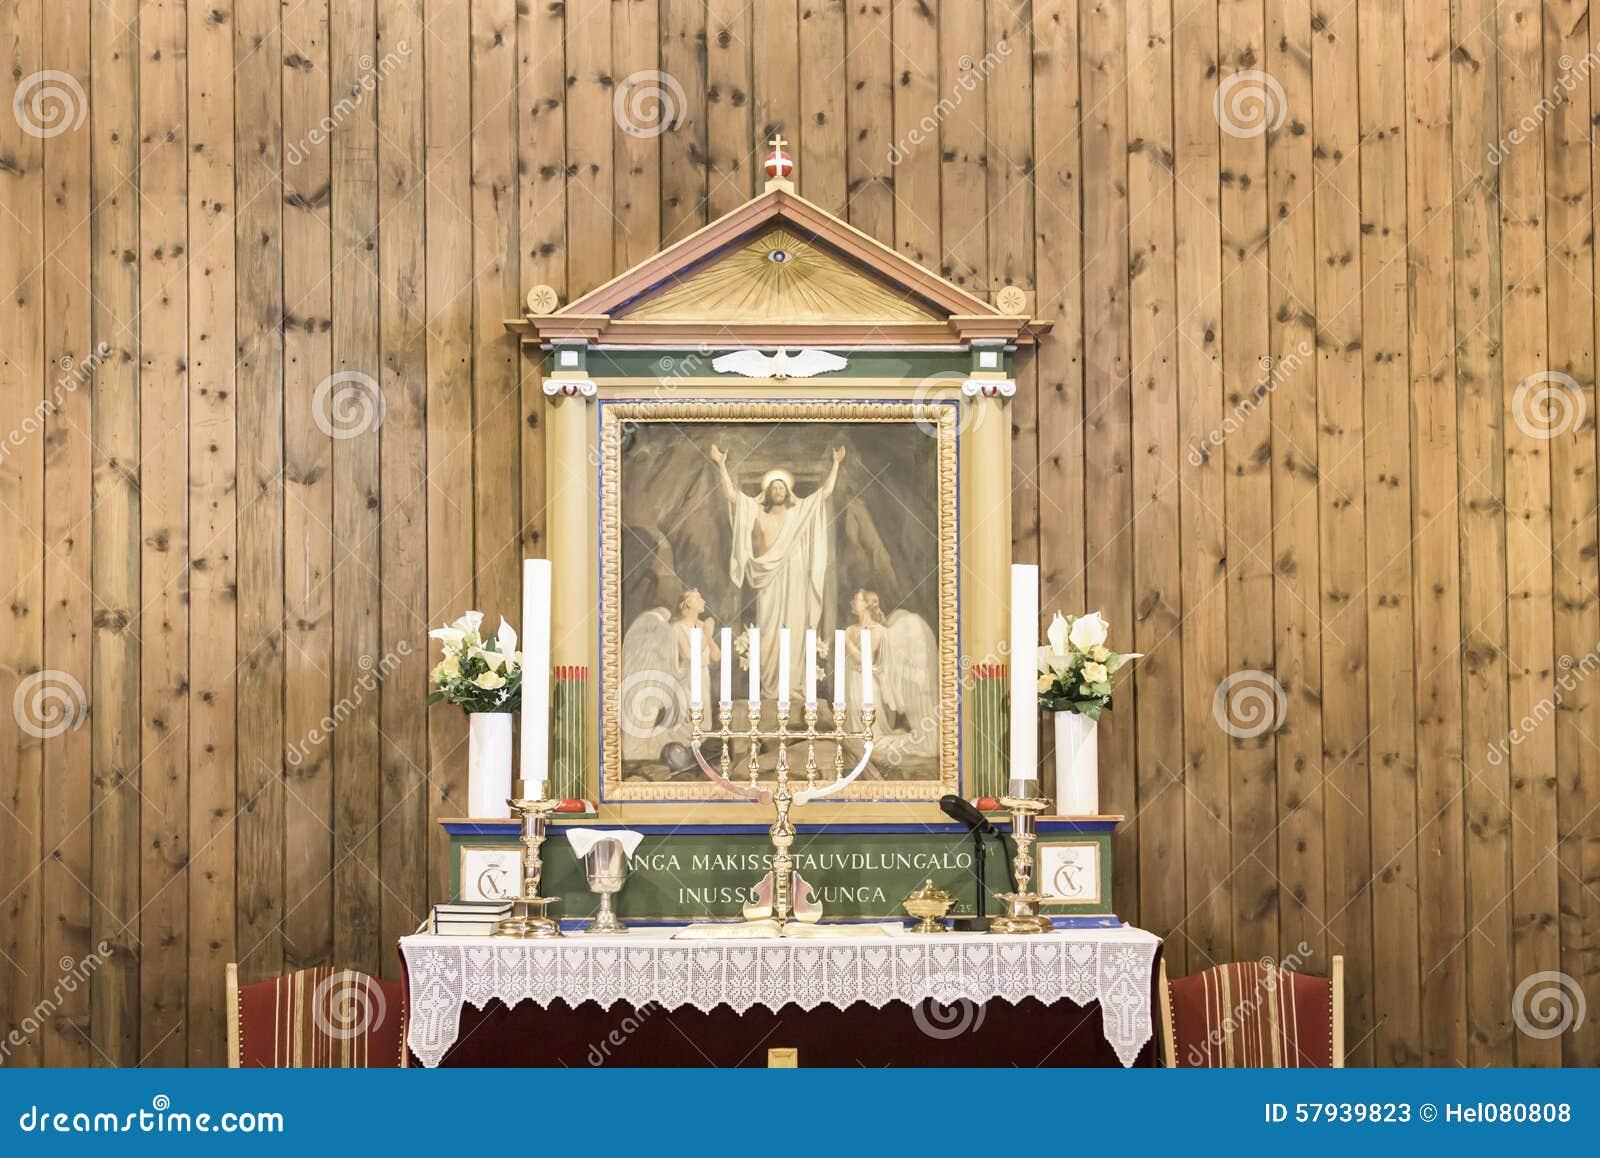 Altar Church Sisimiut, Greenland Stock Photo